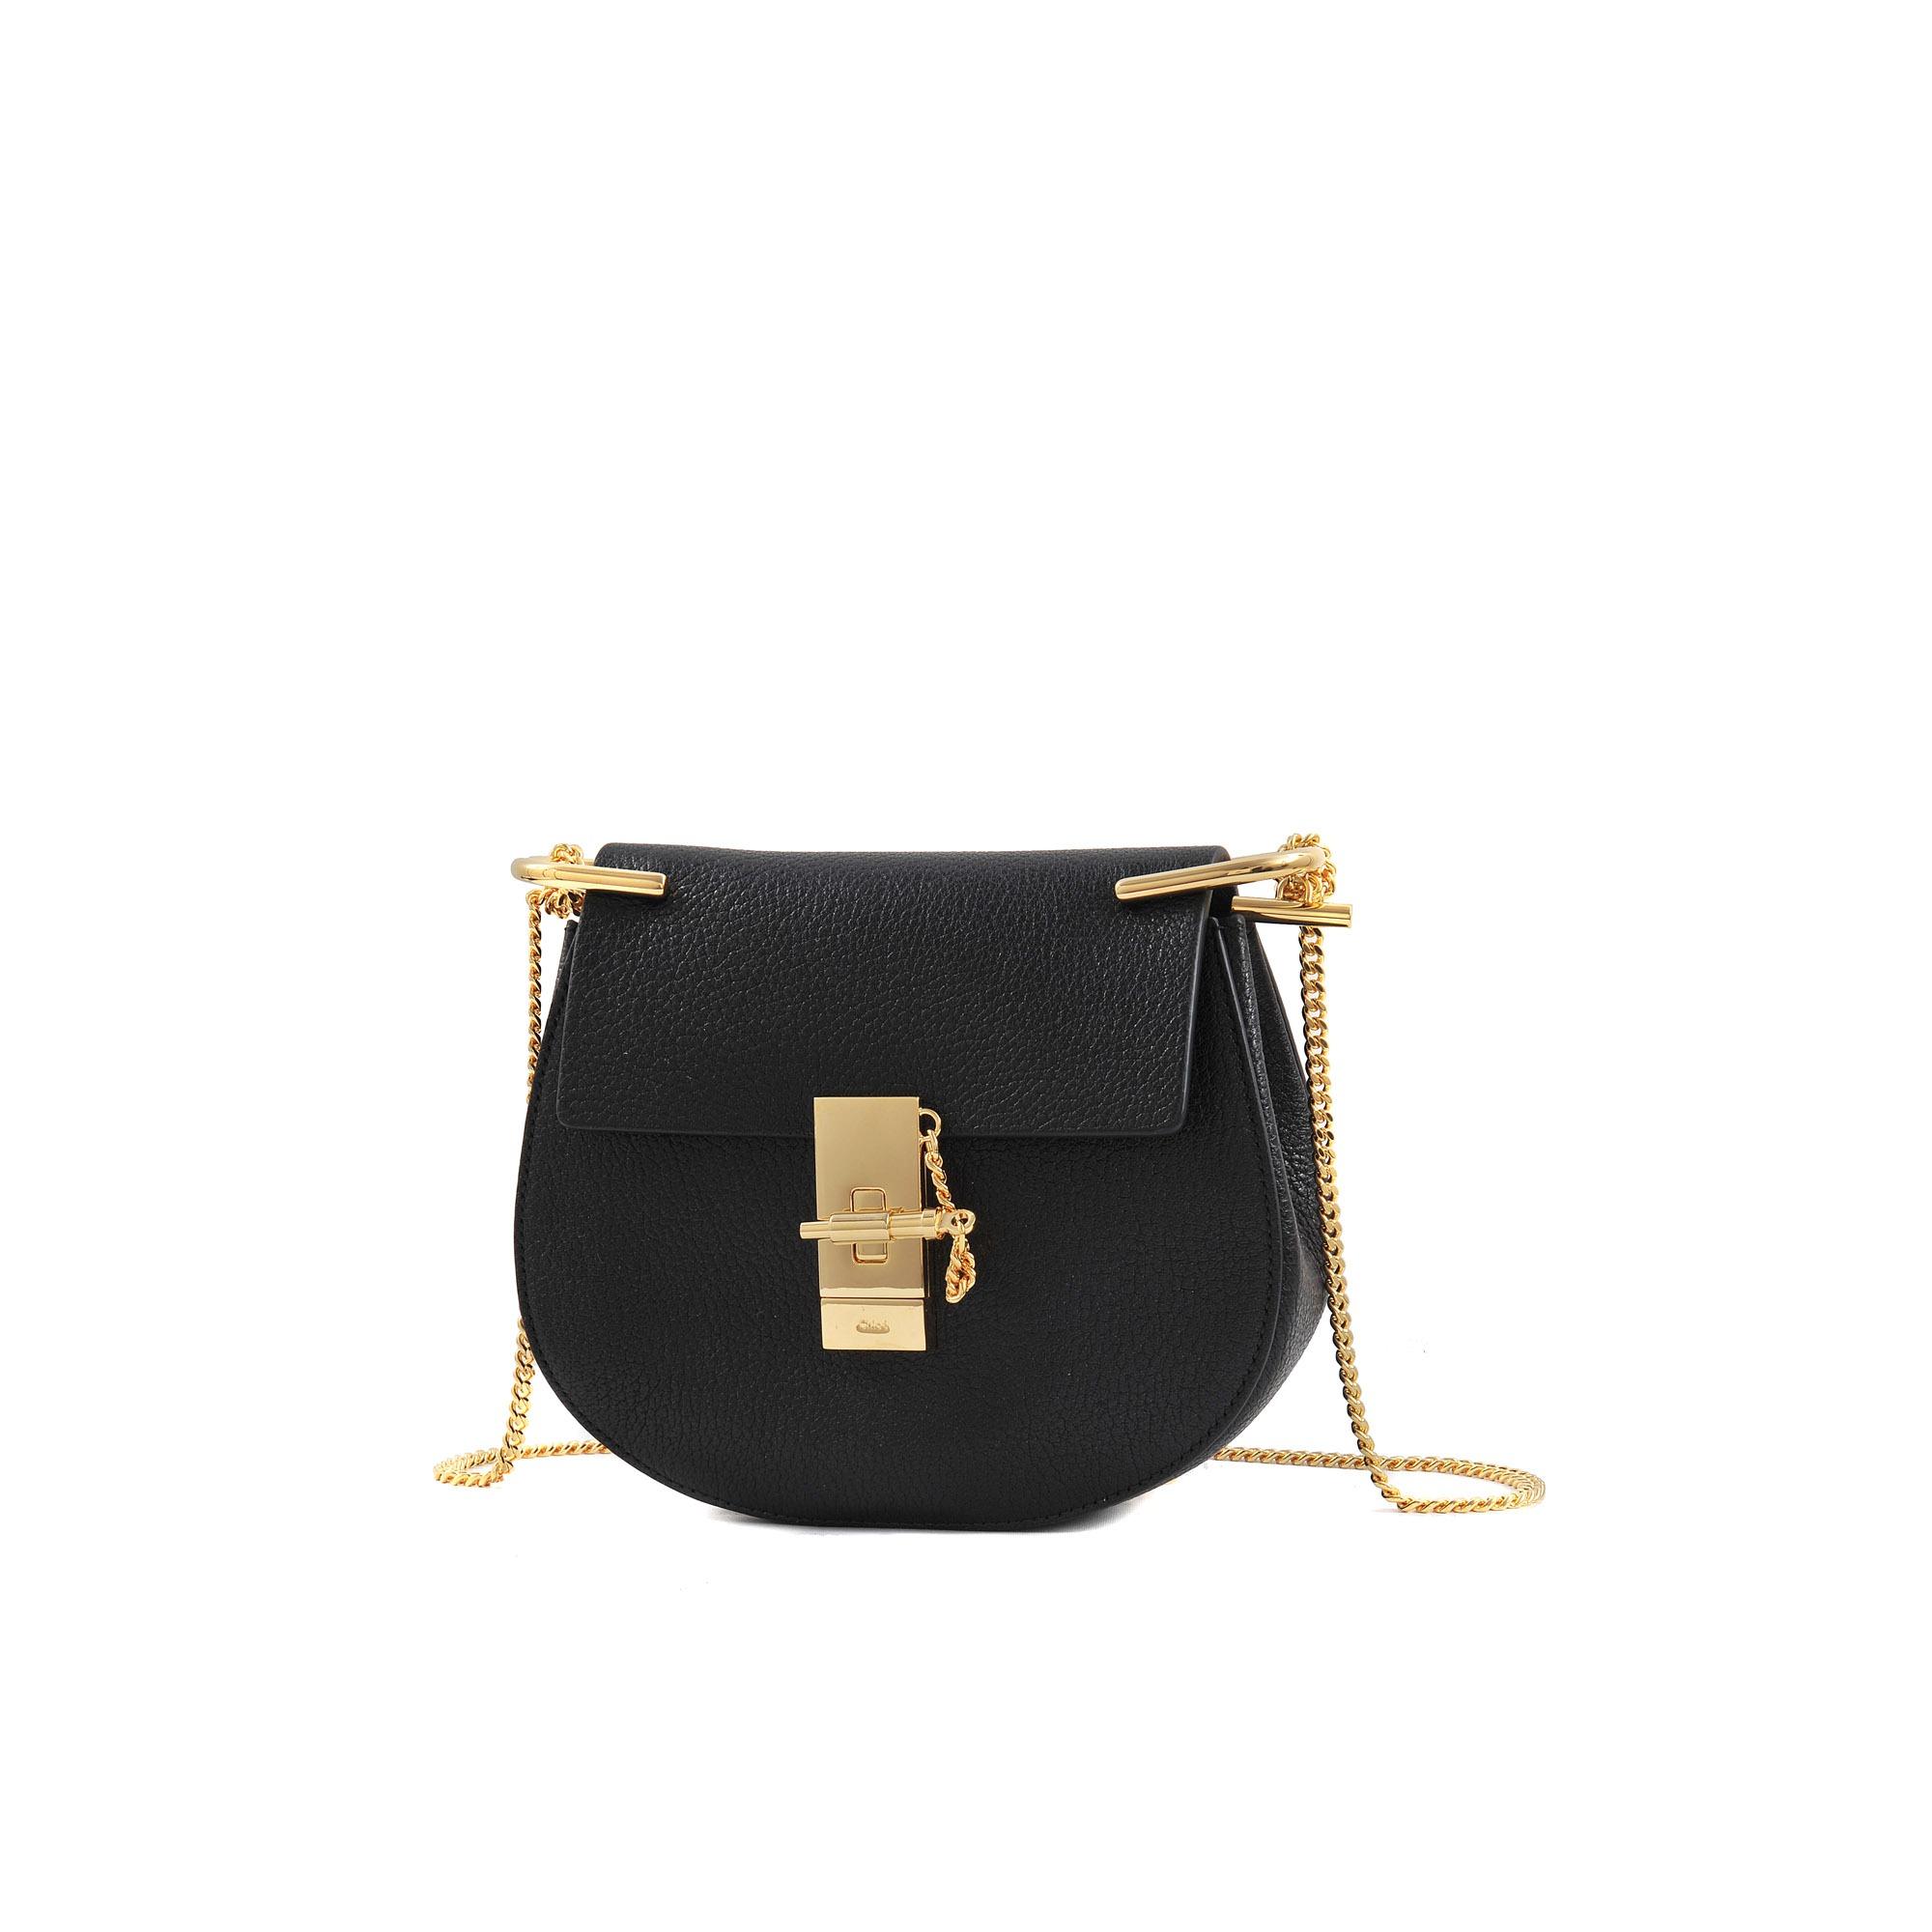 Luxury designer handbags eshop for women